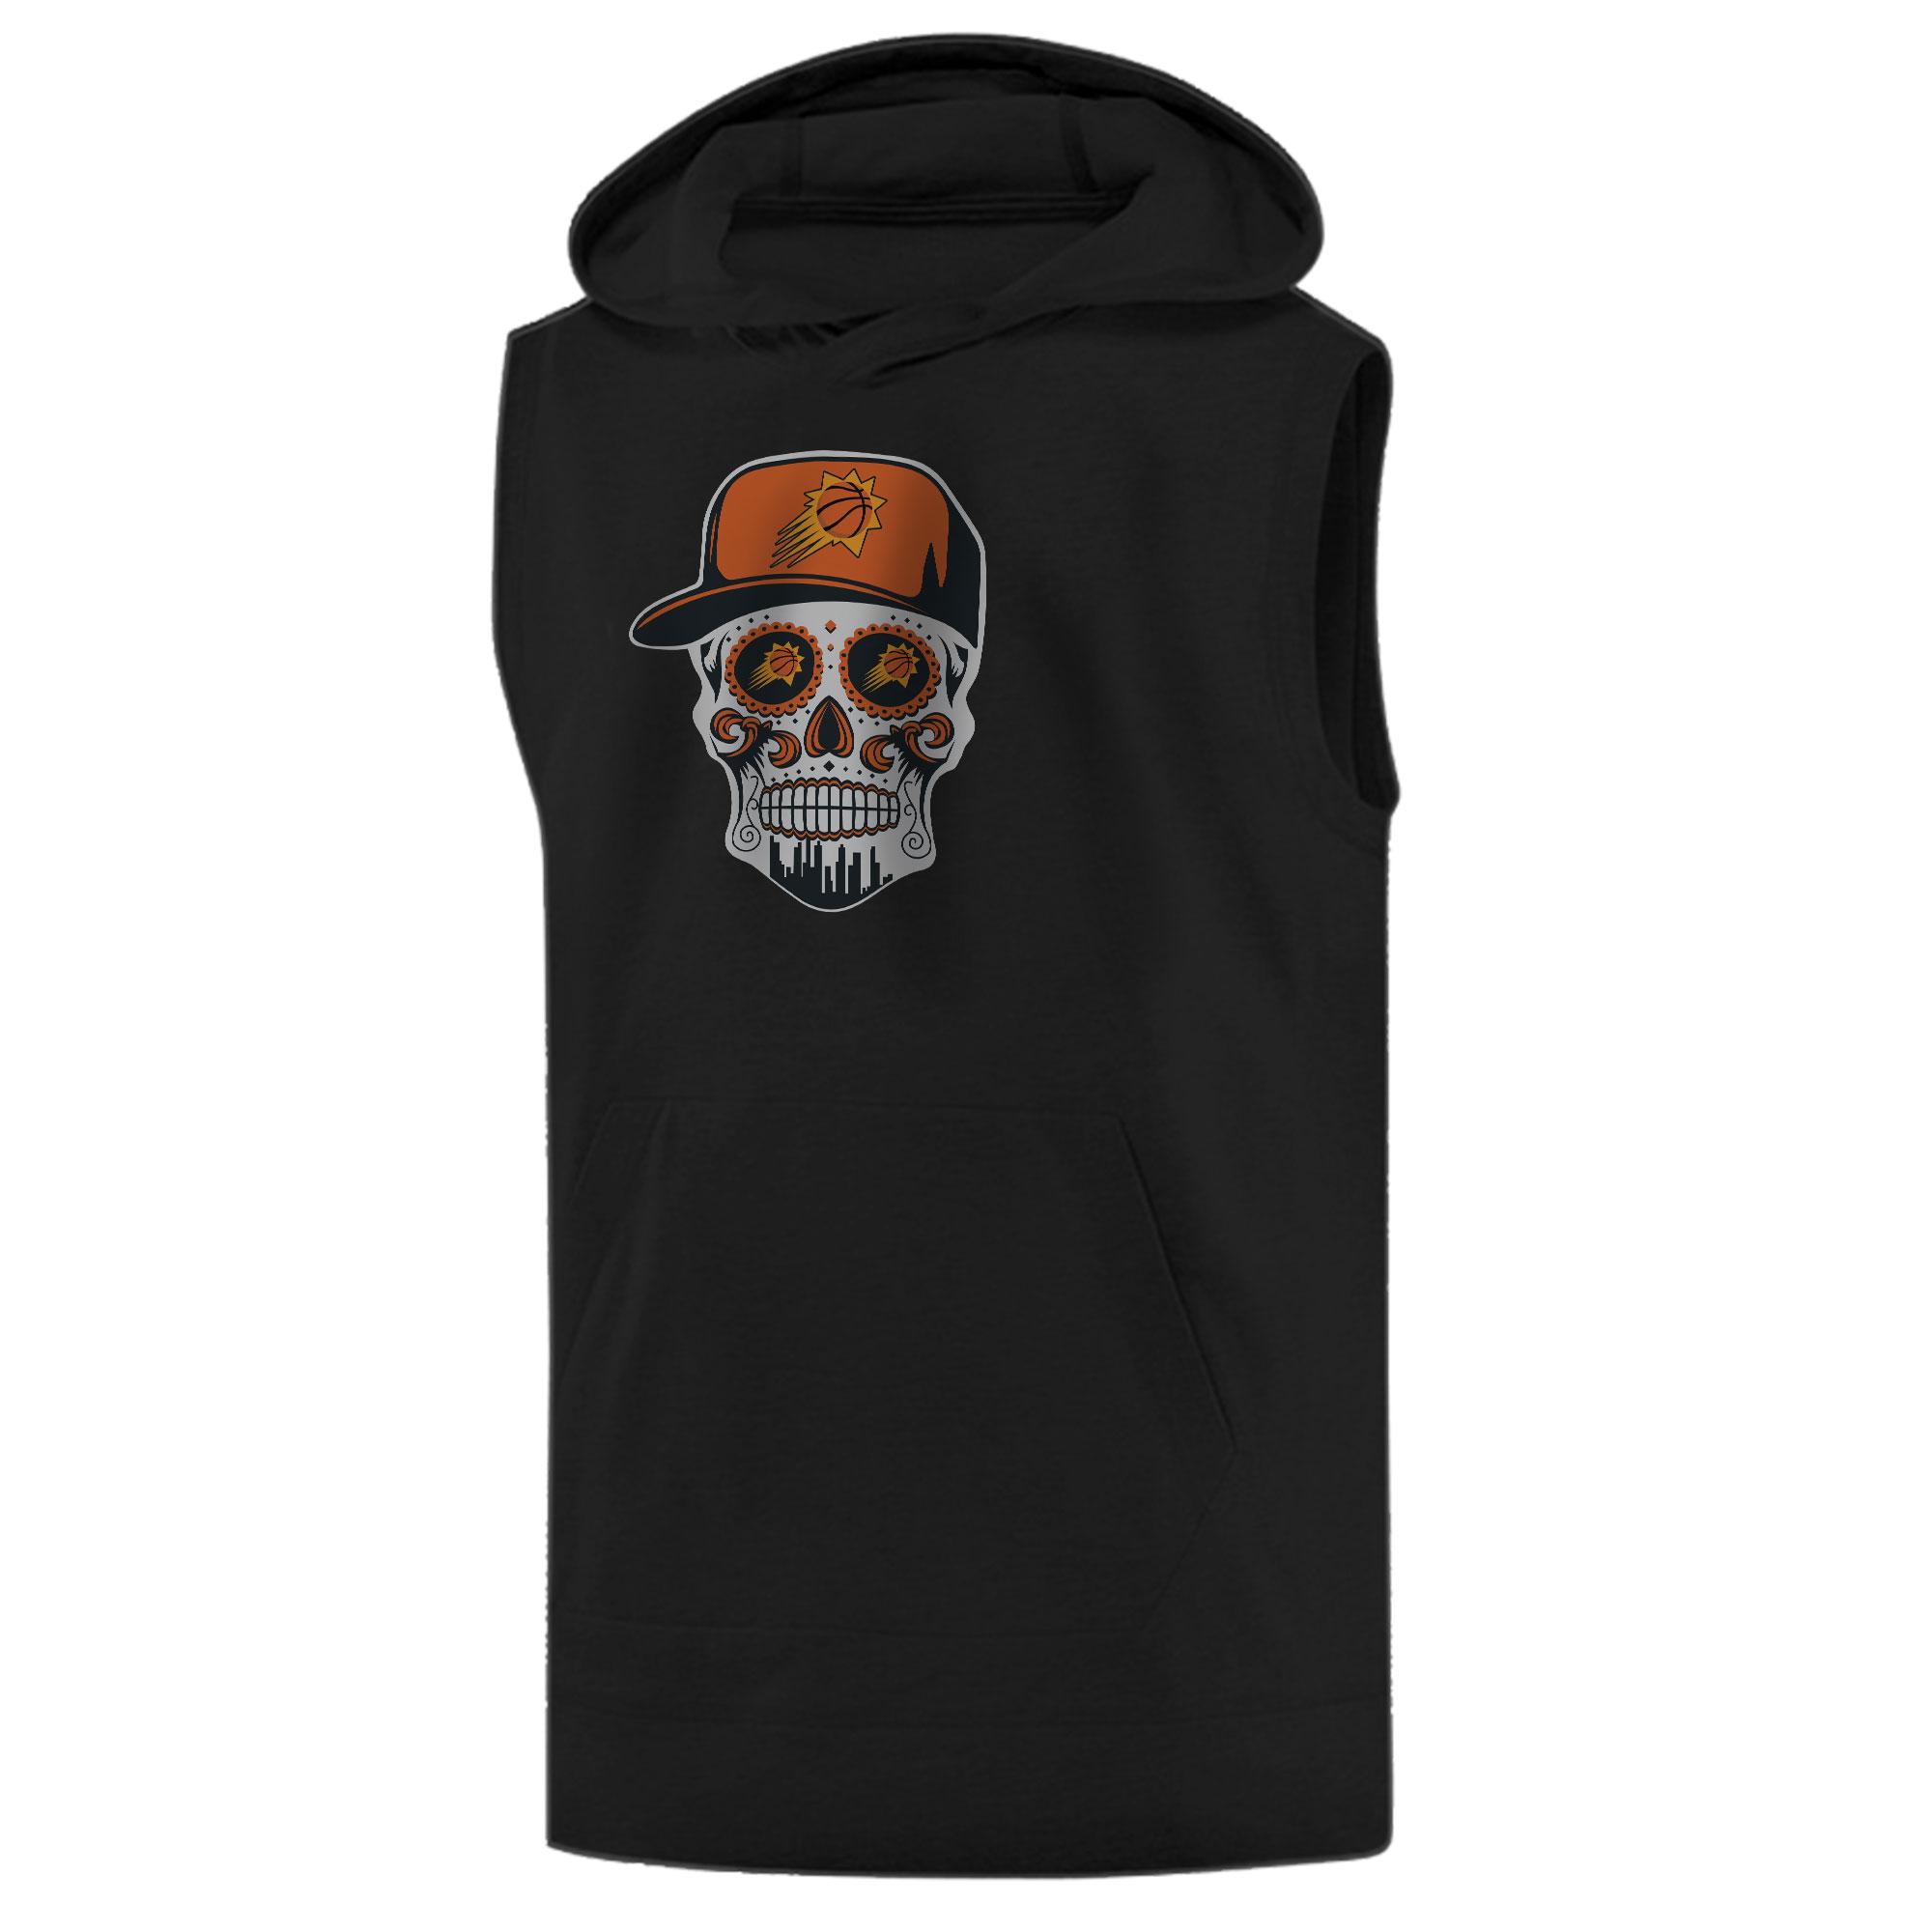 Phoenix Suns Phoenix Skull Sleeveless (KLS-BLC-NP-461-NBA-PHO-SKULL)